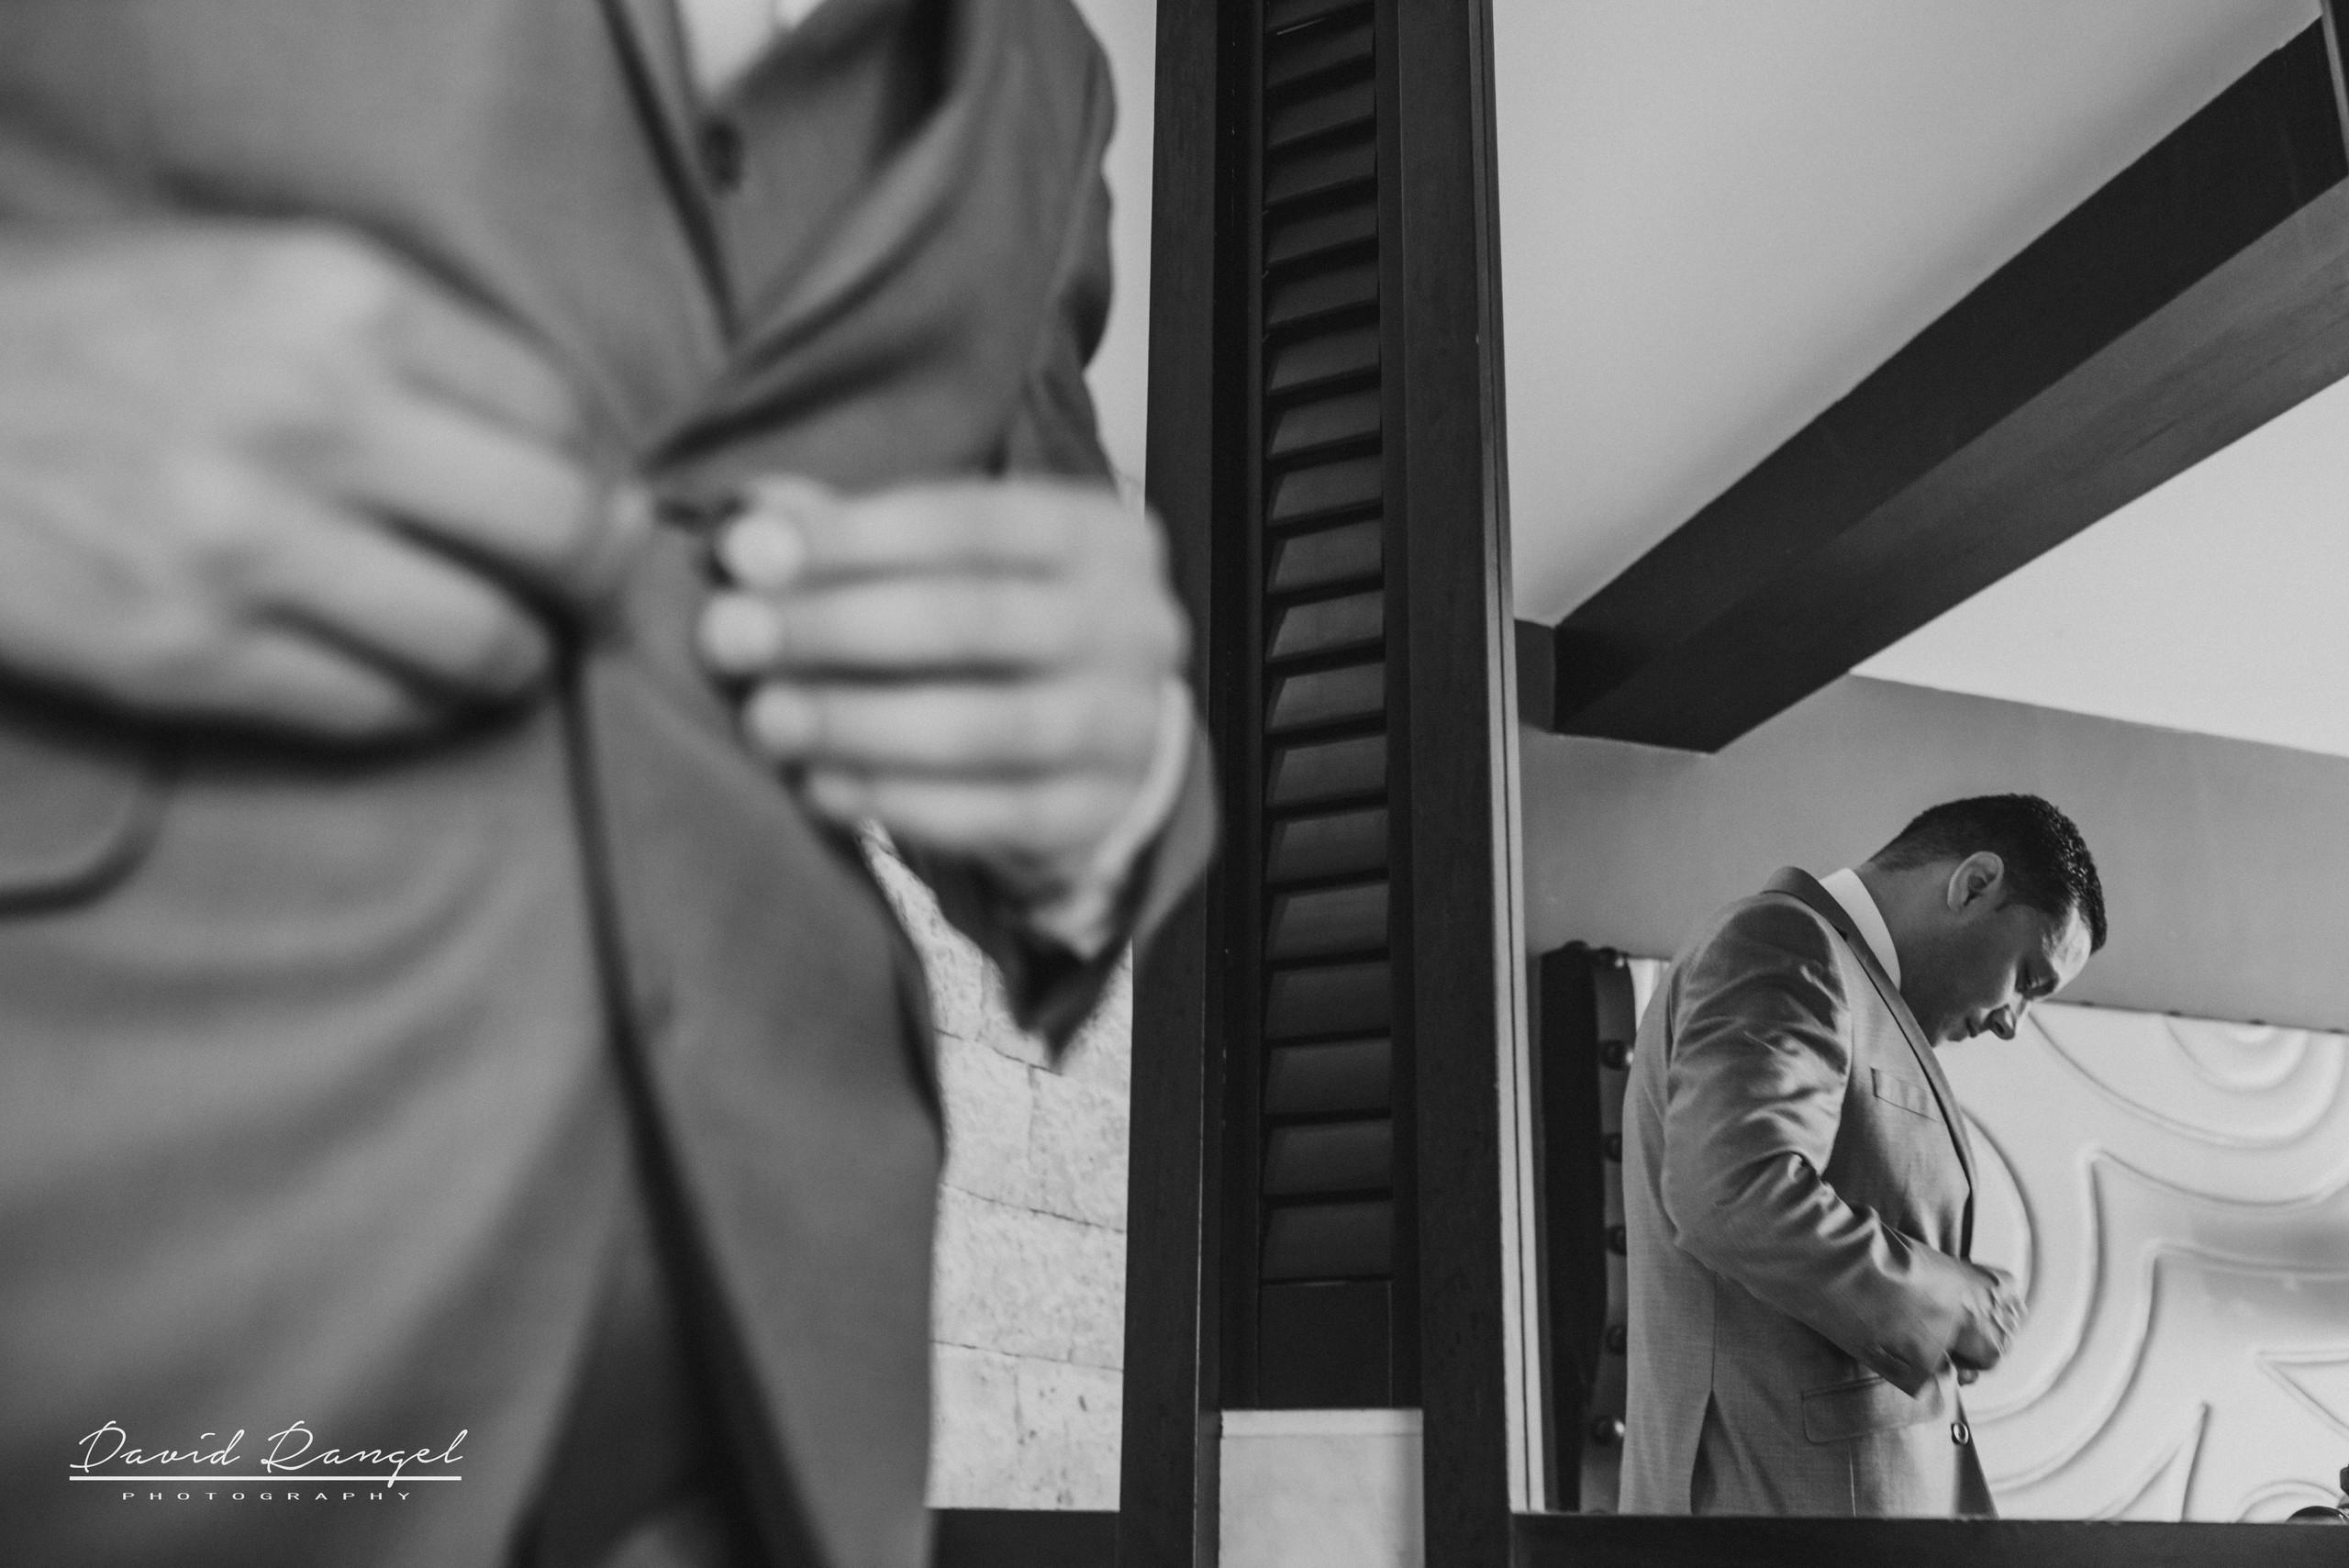 david+rangel+photography